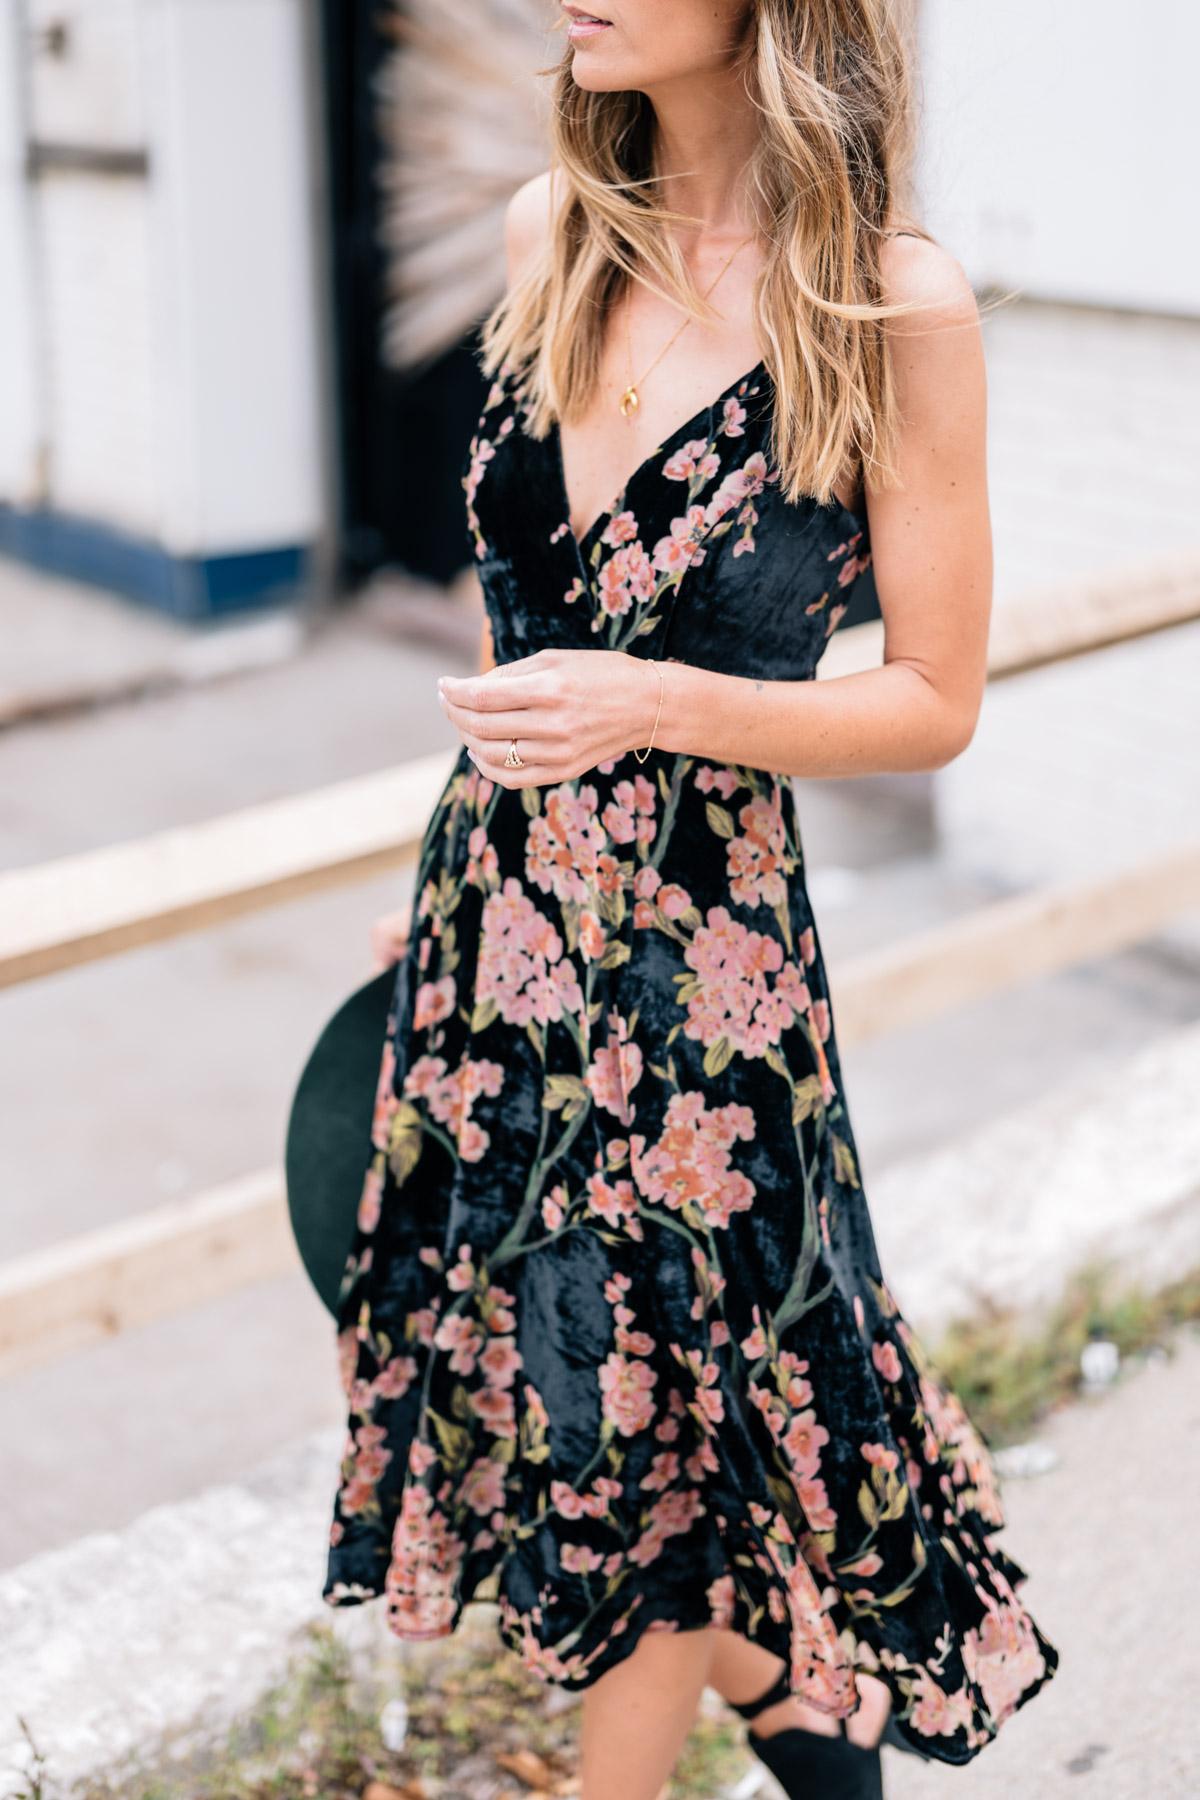 Jess Ann Kirby wears a floral velvet slip dress from Anthropologie for fall wedding style